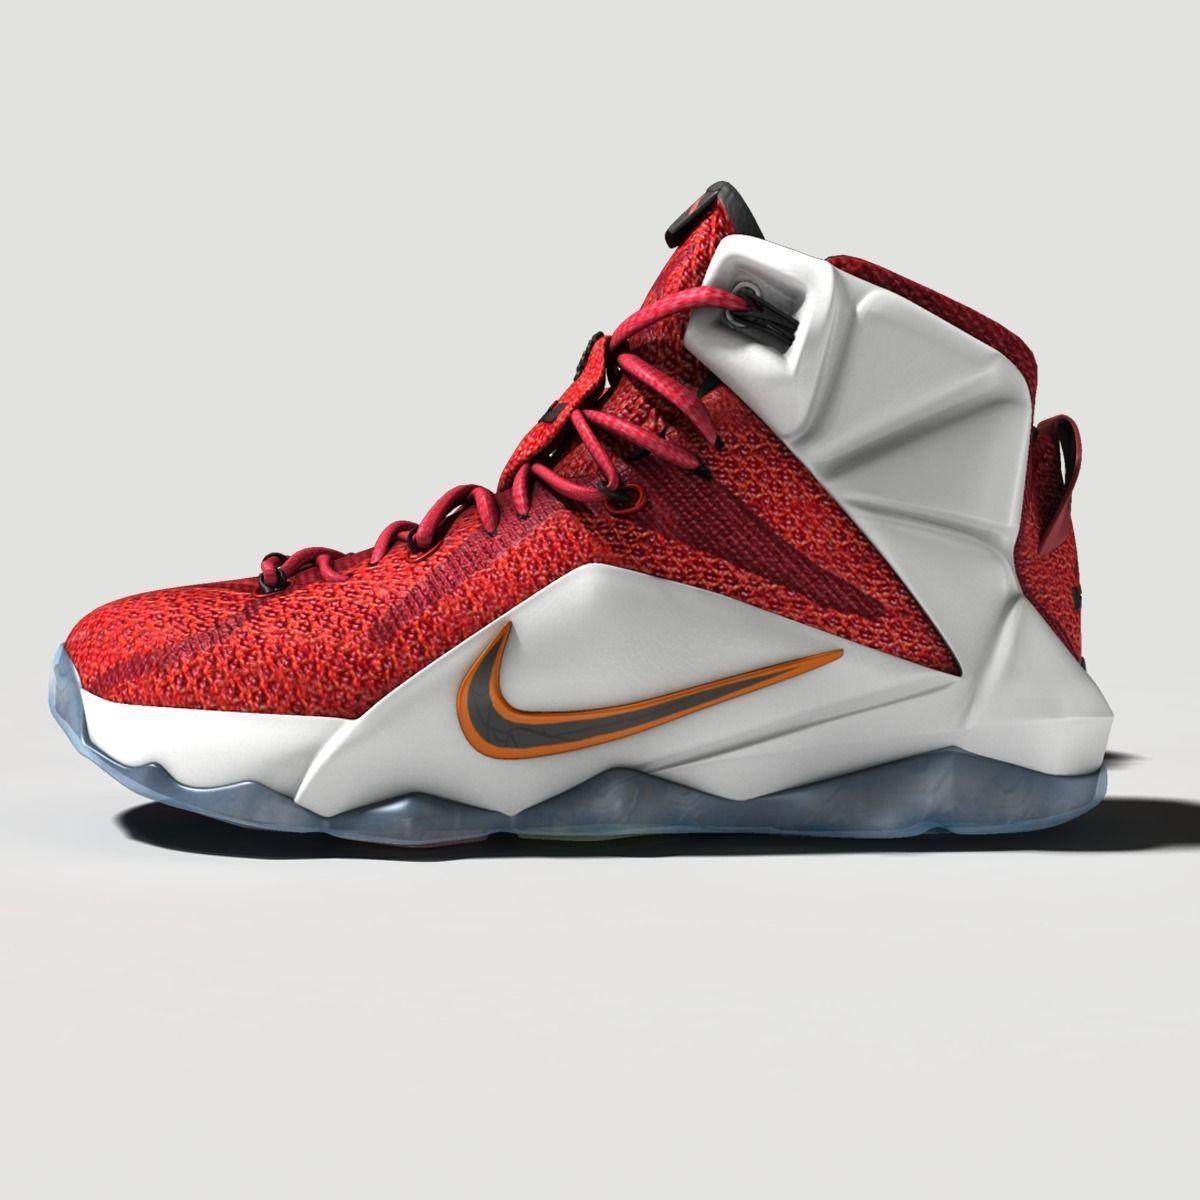 Lebron james shoes 12